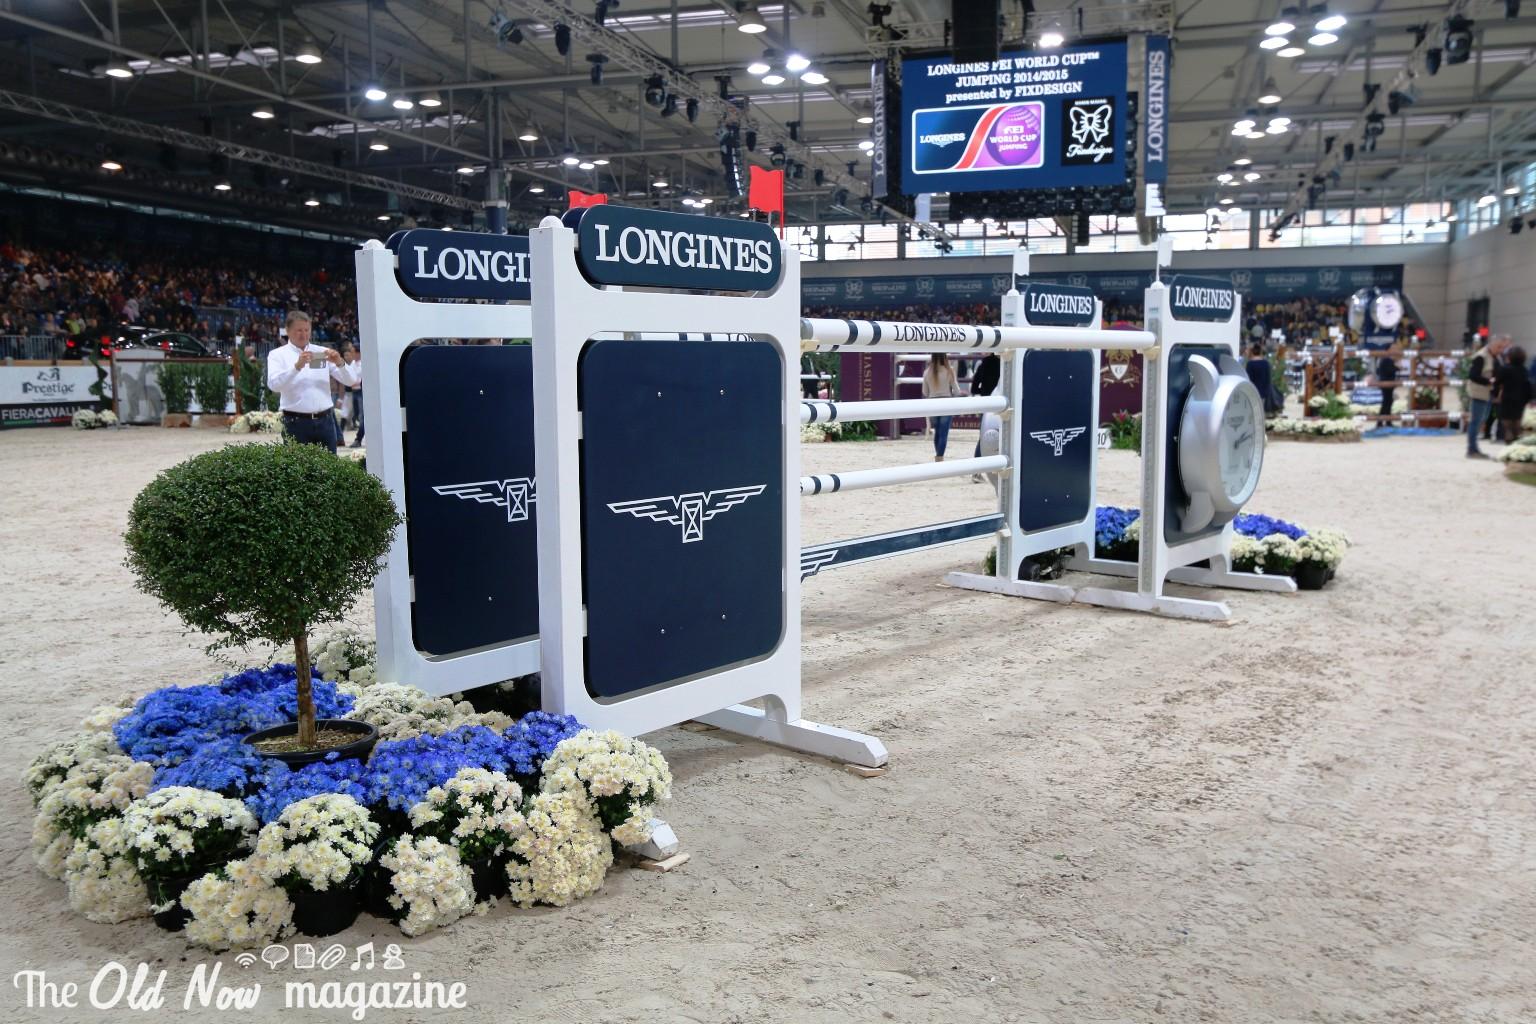 verona cavalli 2014 gmc - photo#44